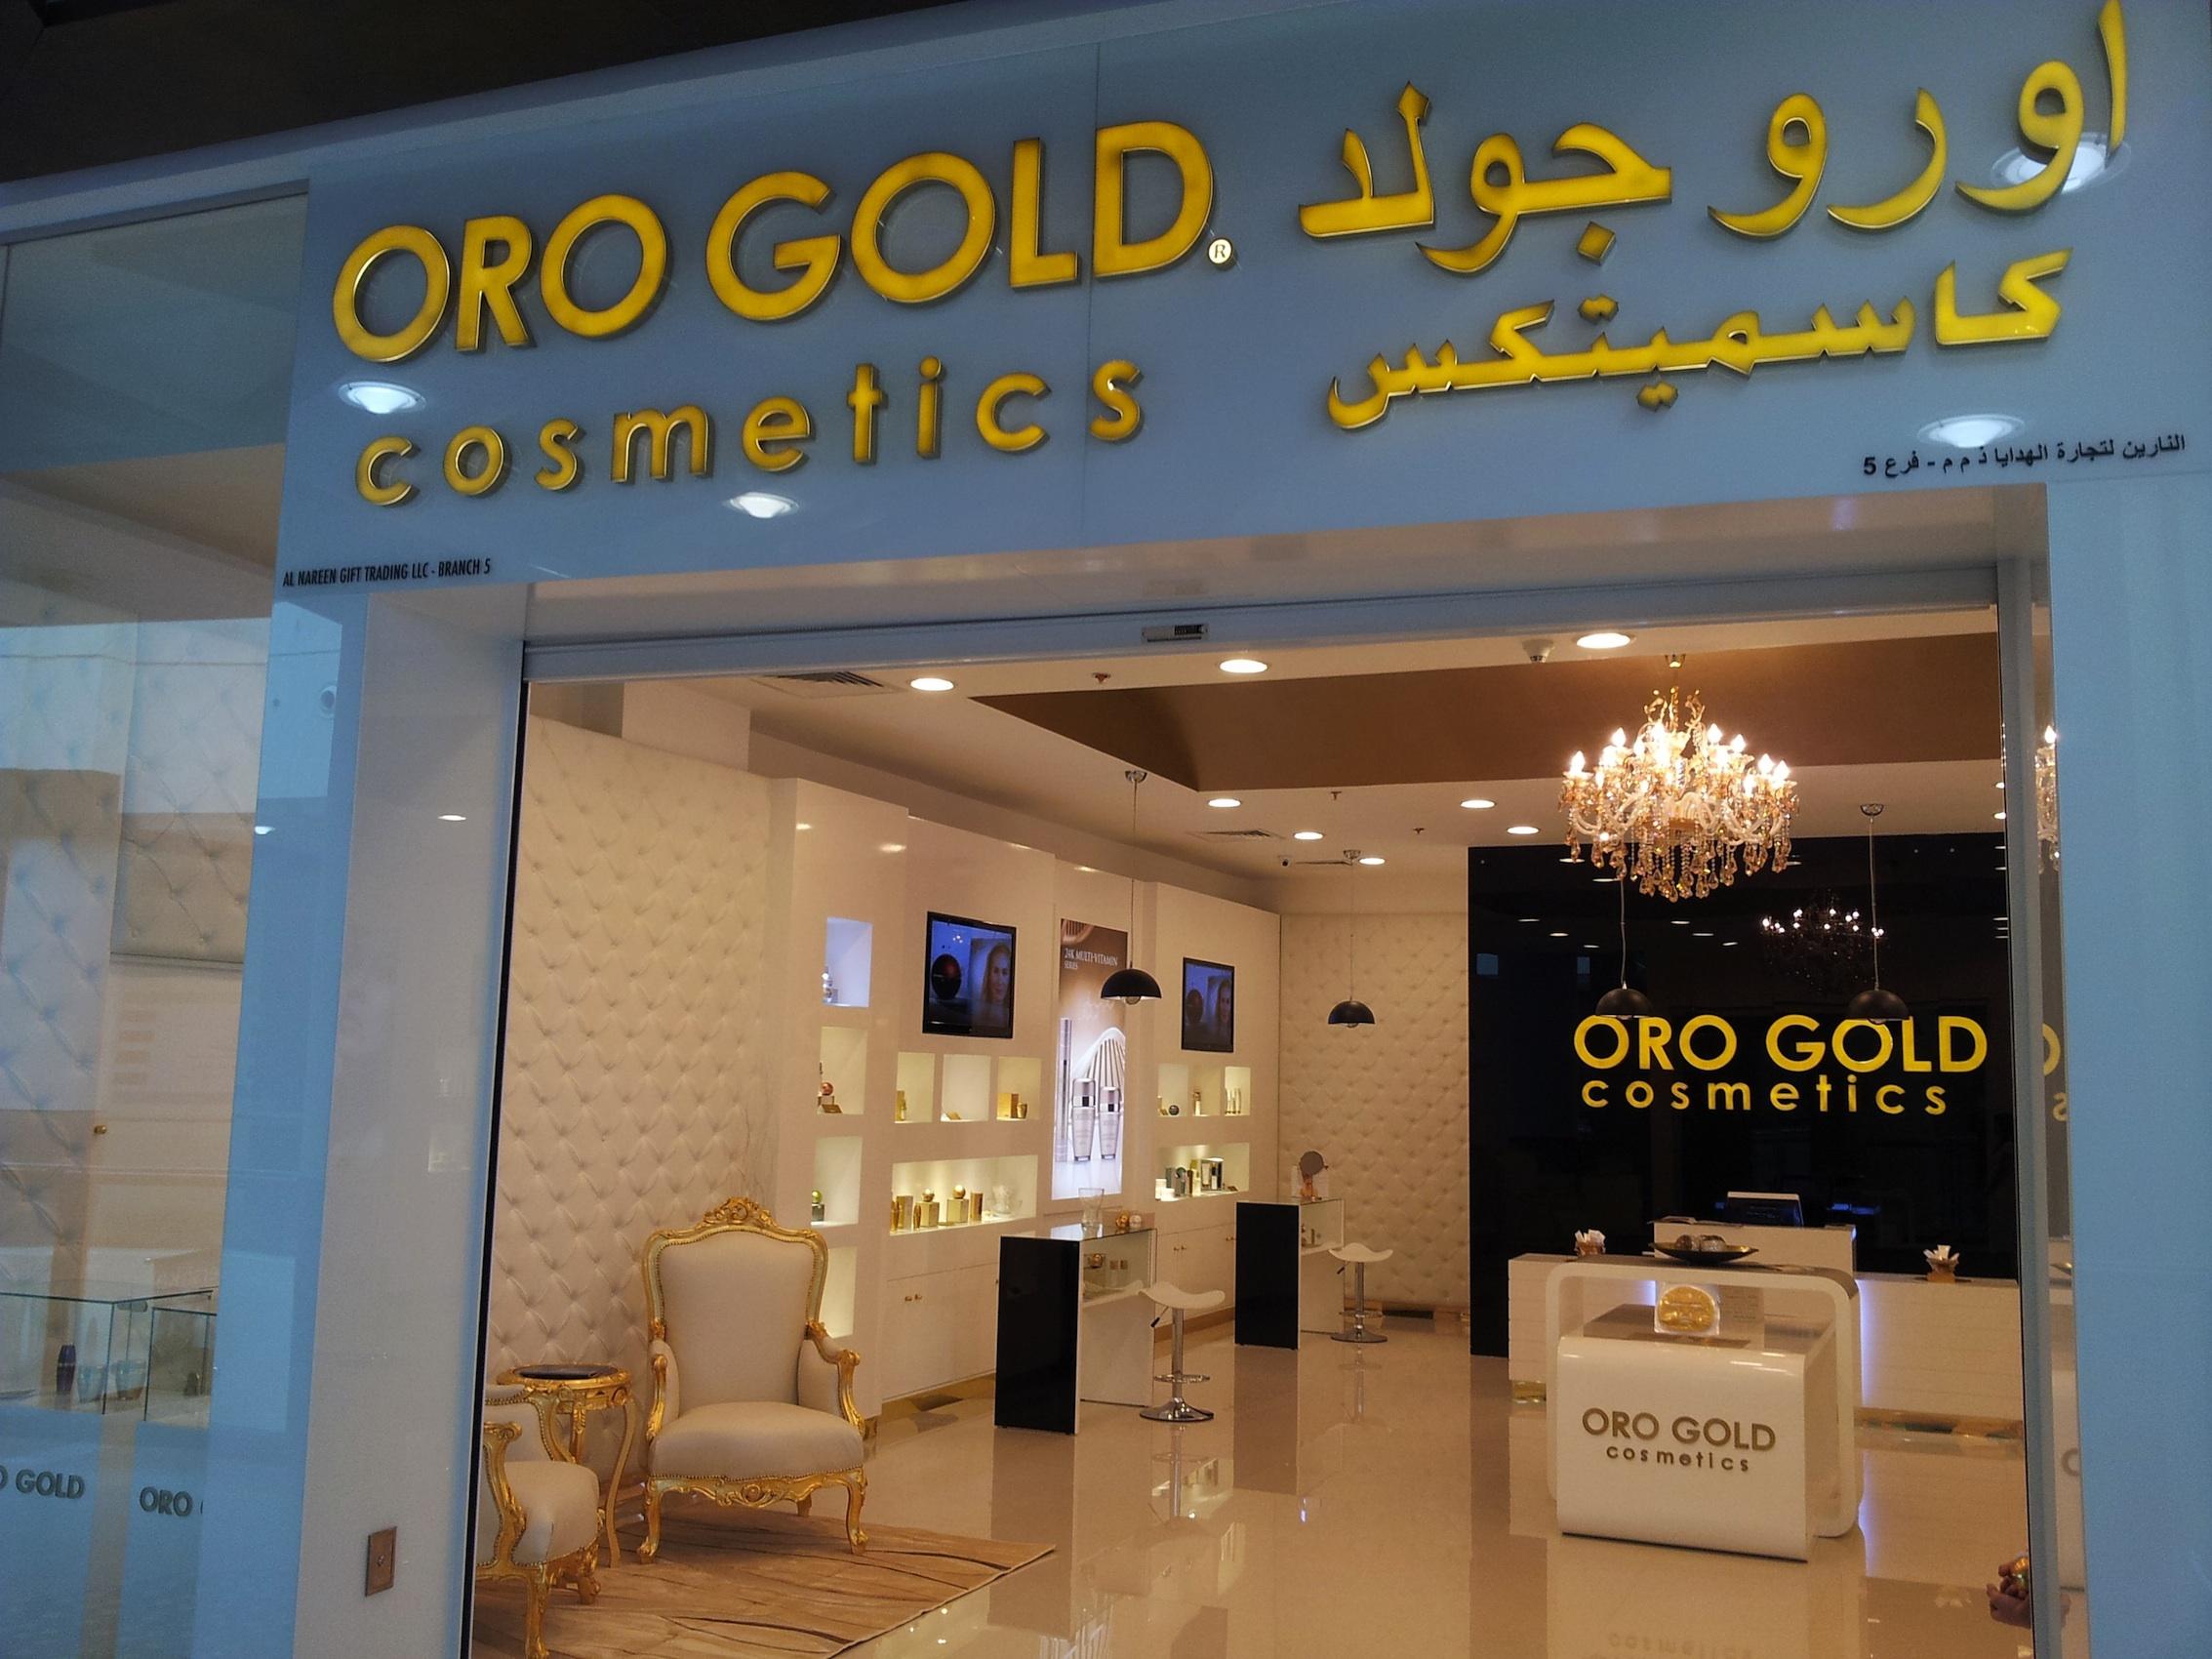 Gallery orogold store locator abu dhabi oro gold store solutioingenieria Choice Image